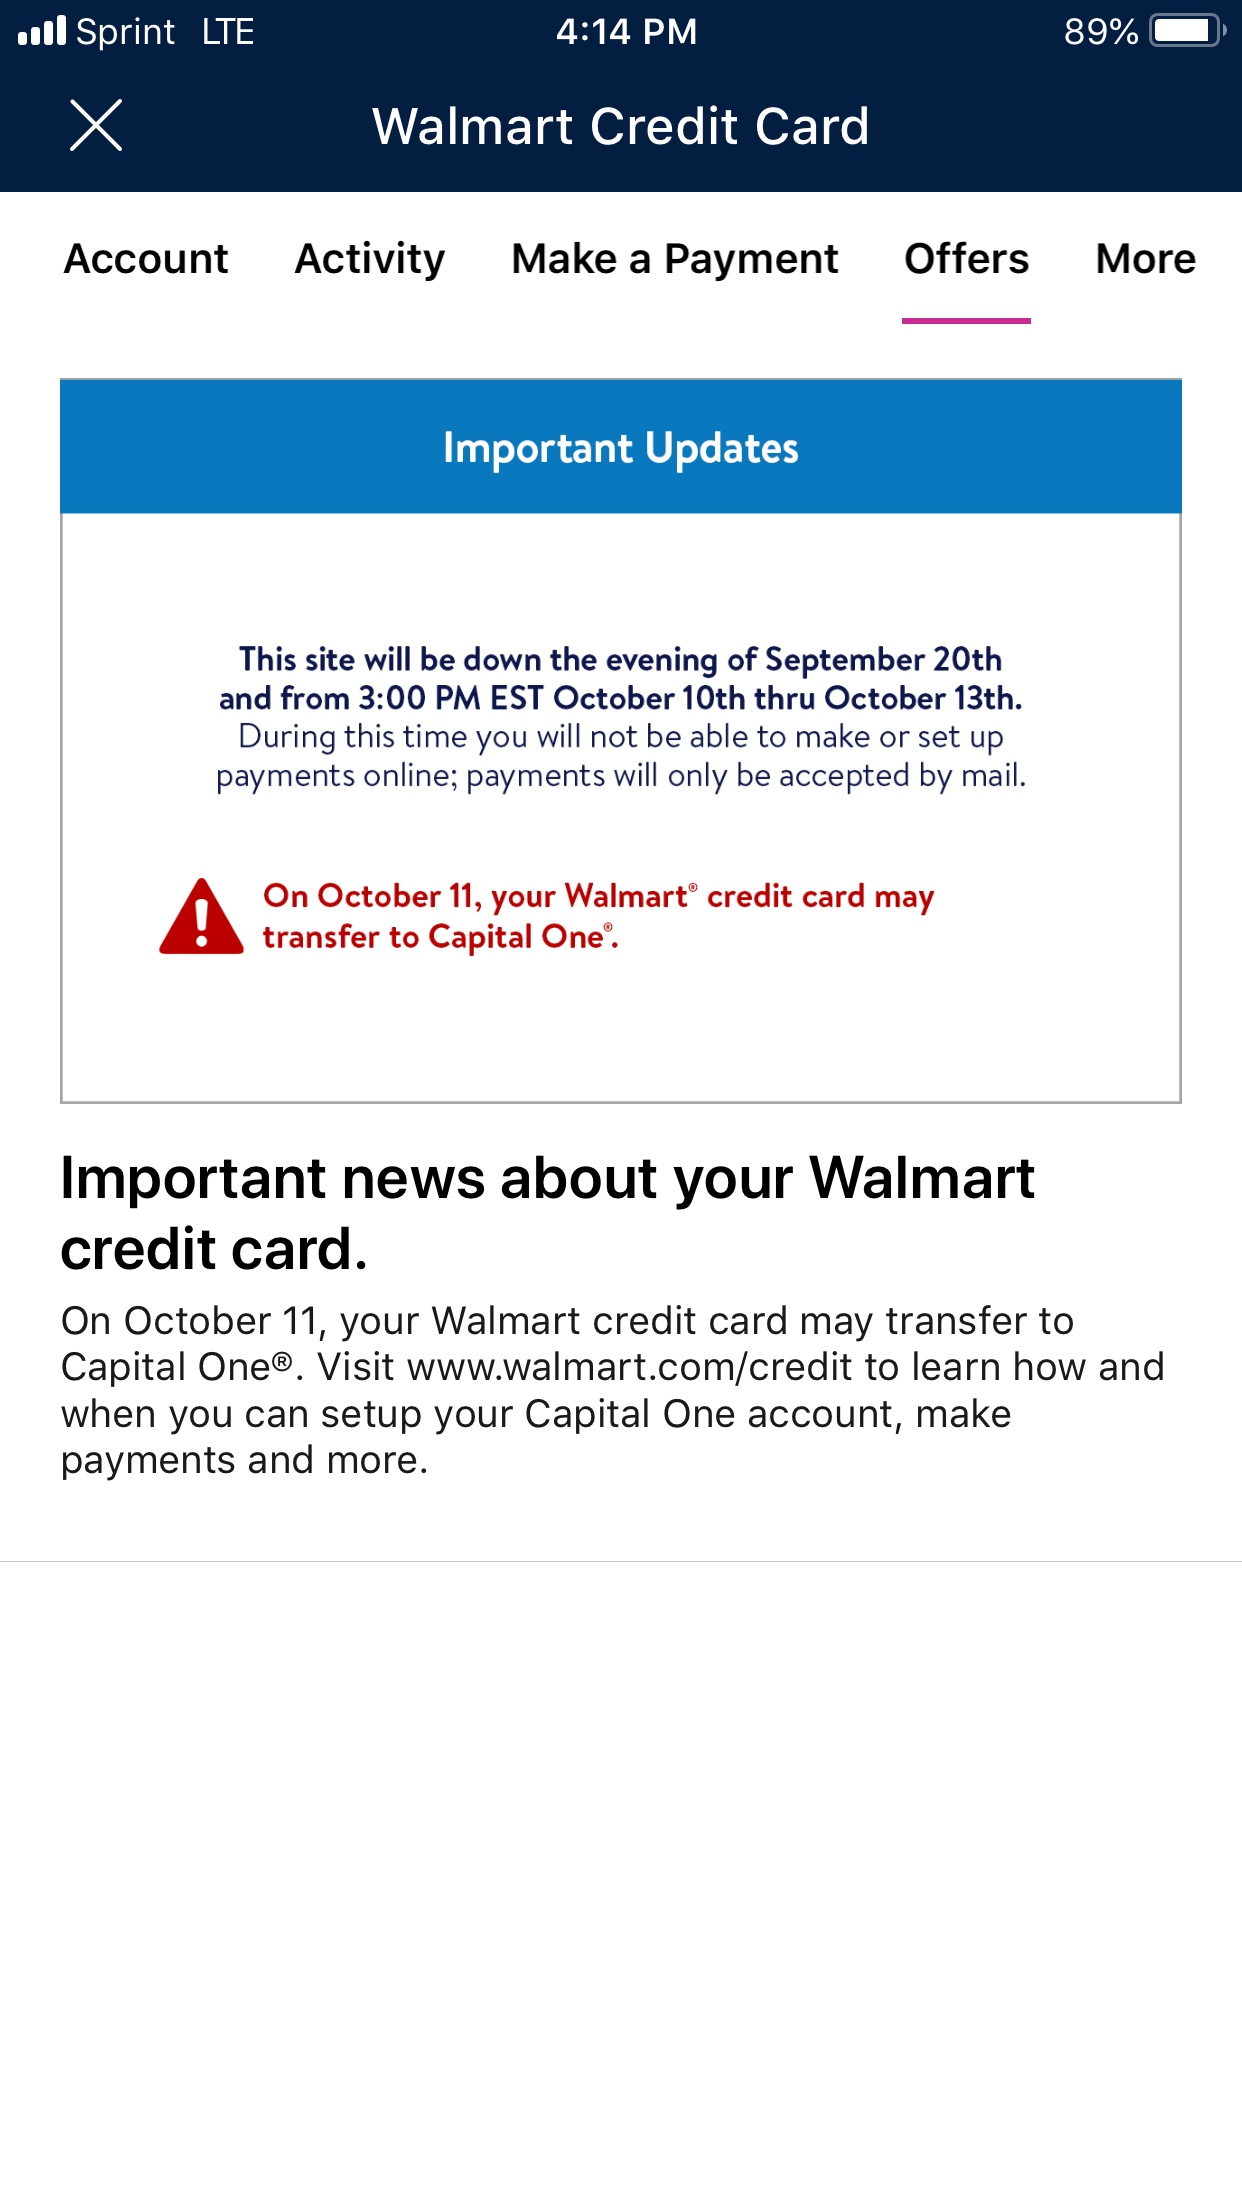 capital one walmart credit card app